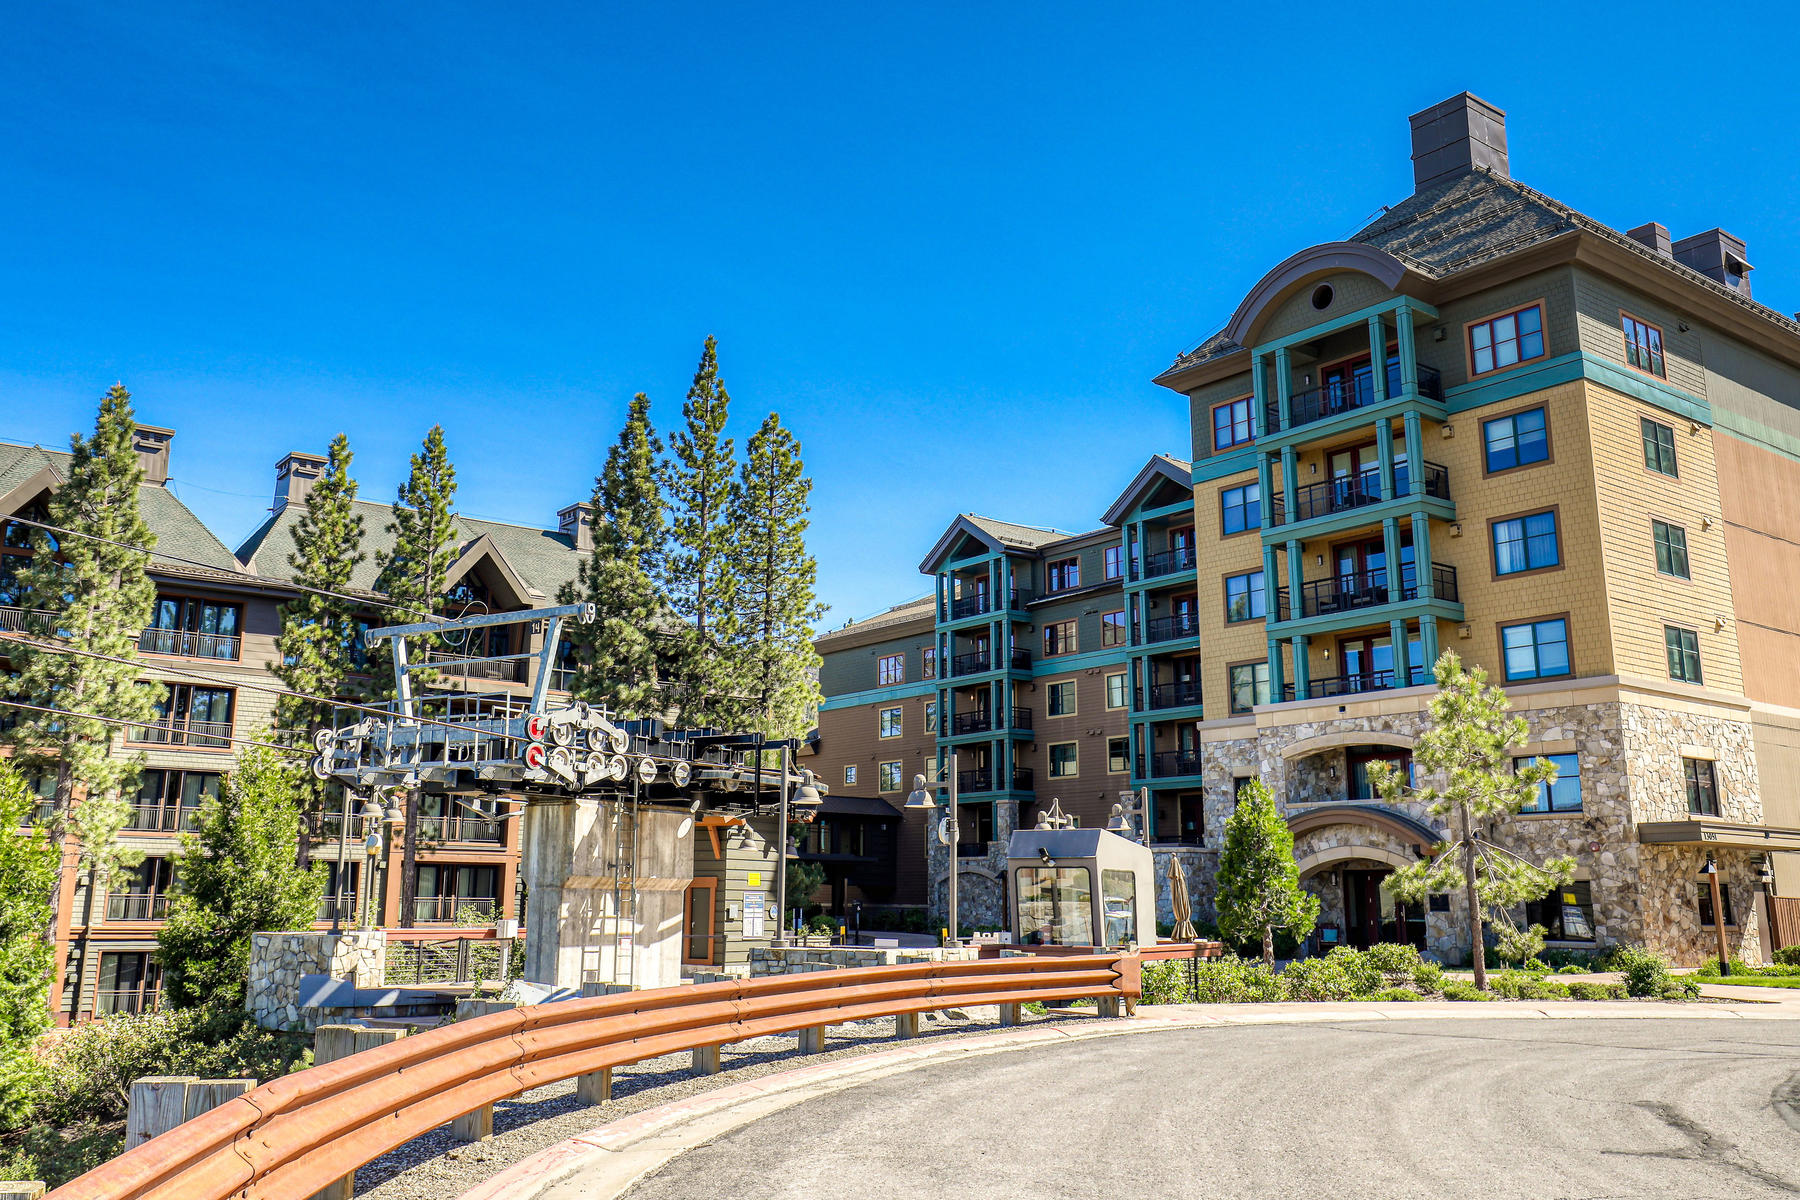 Additional photo for property listing at Turnkey luxury slope-side residence adjacent to the 5-Star Ritz Carlton Hotel 13051 Ritz-Carlton Highlands Court, Unit #4205 Truckee, California 96161 United States